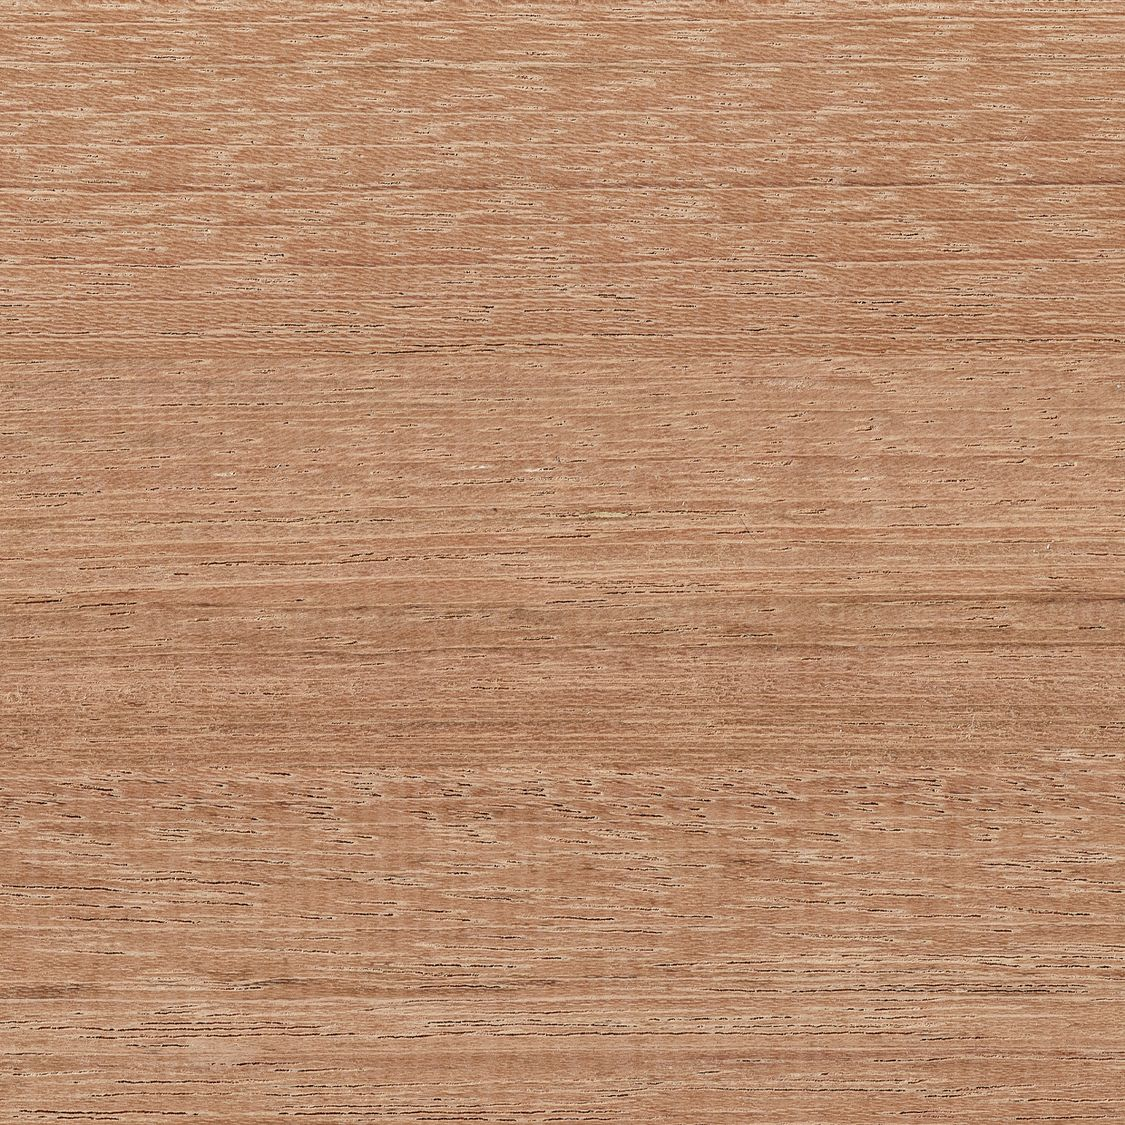 Jatoba hardwood